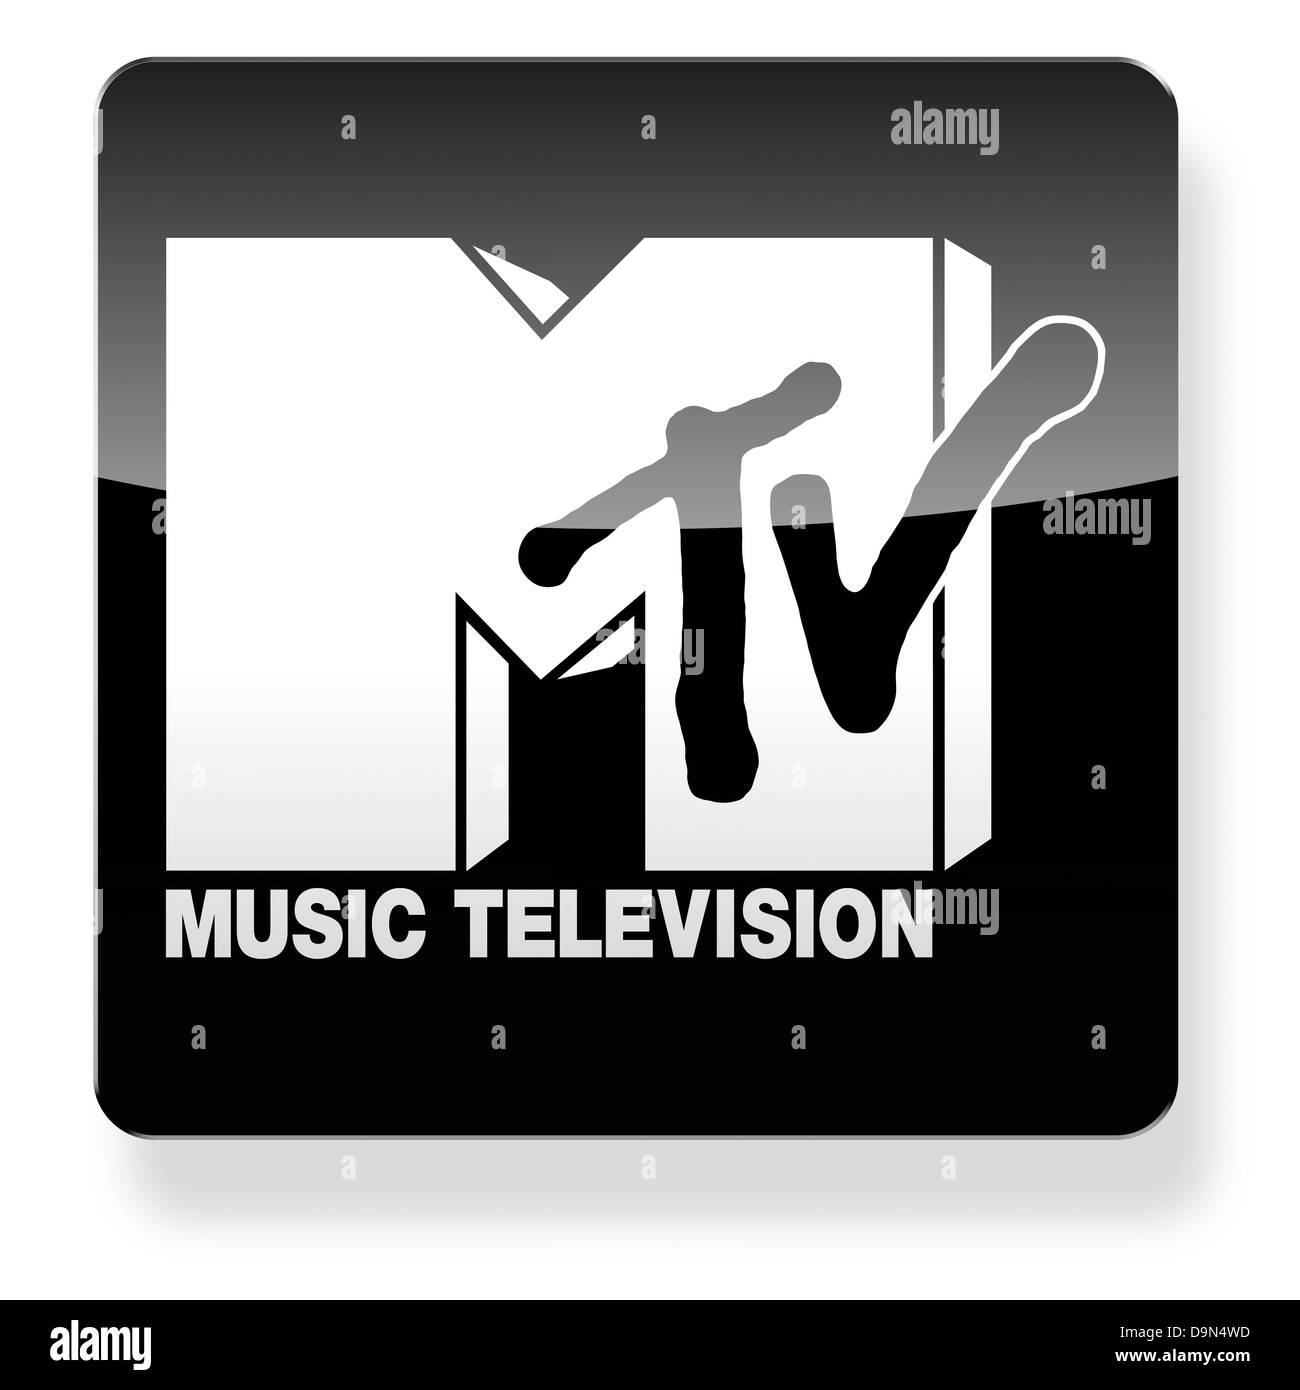 Mtv Logo Stock Photos Mtv Logo Stock Images Alamy